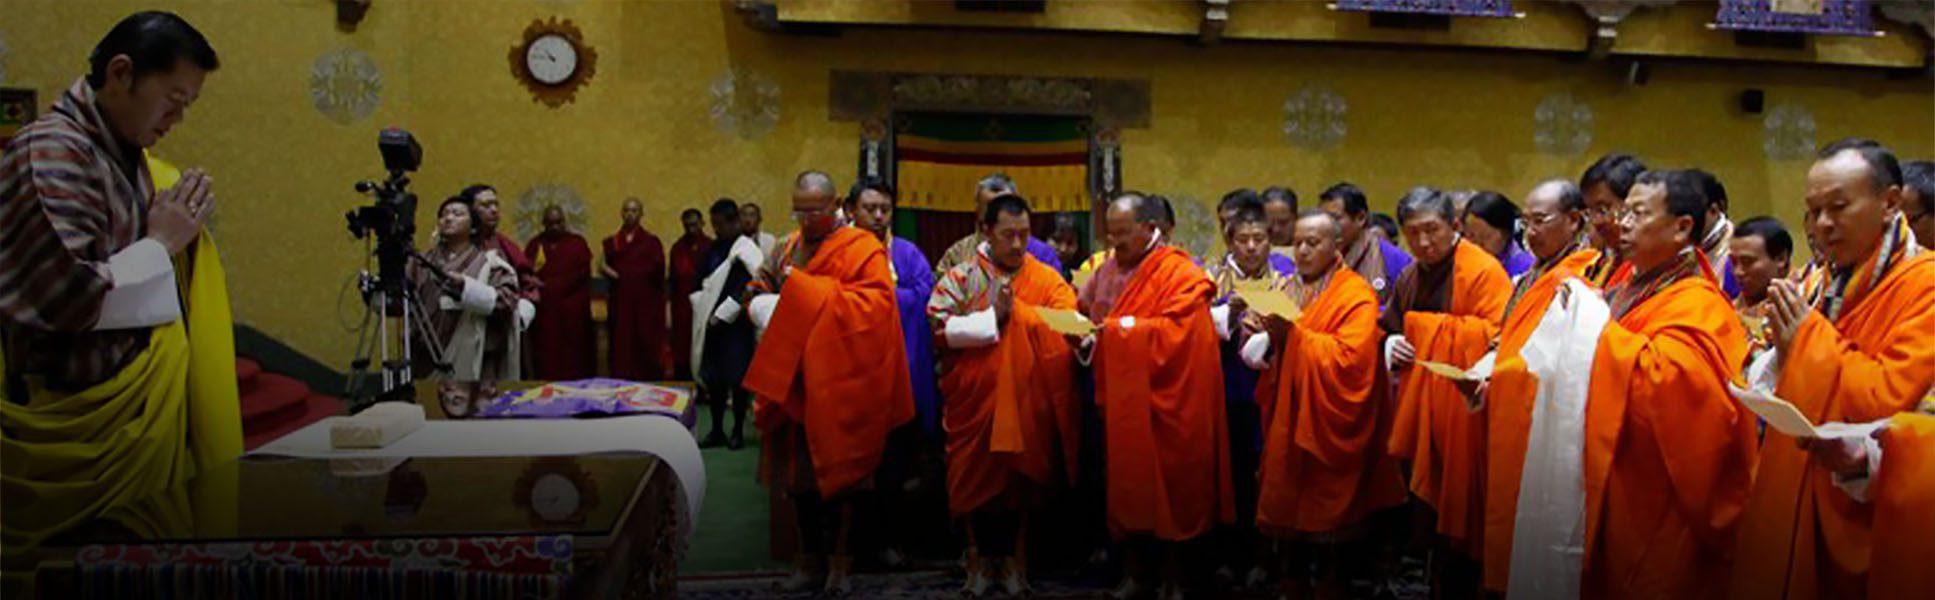 The Constitution of Bhutan